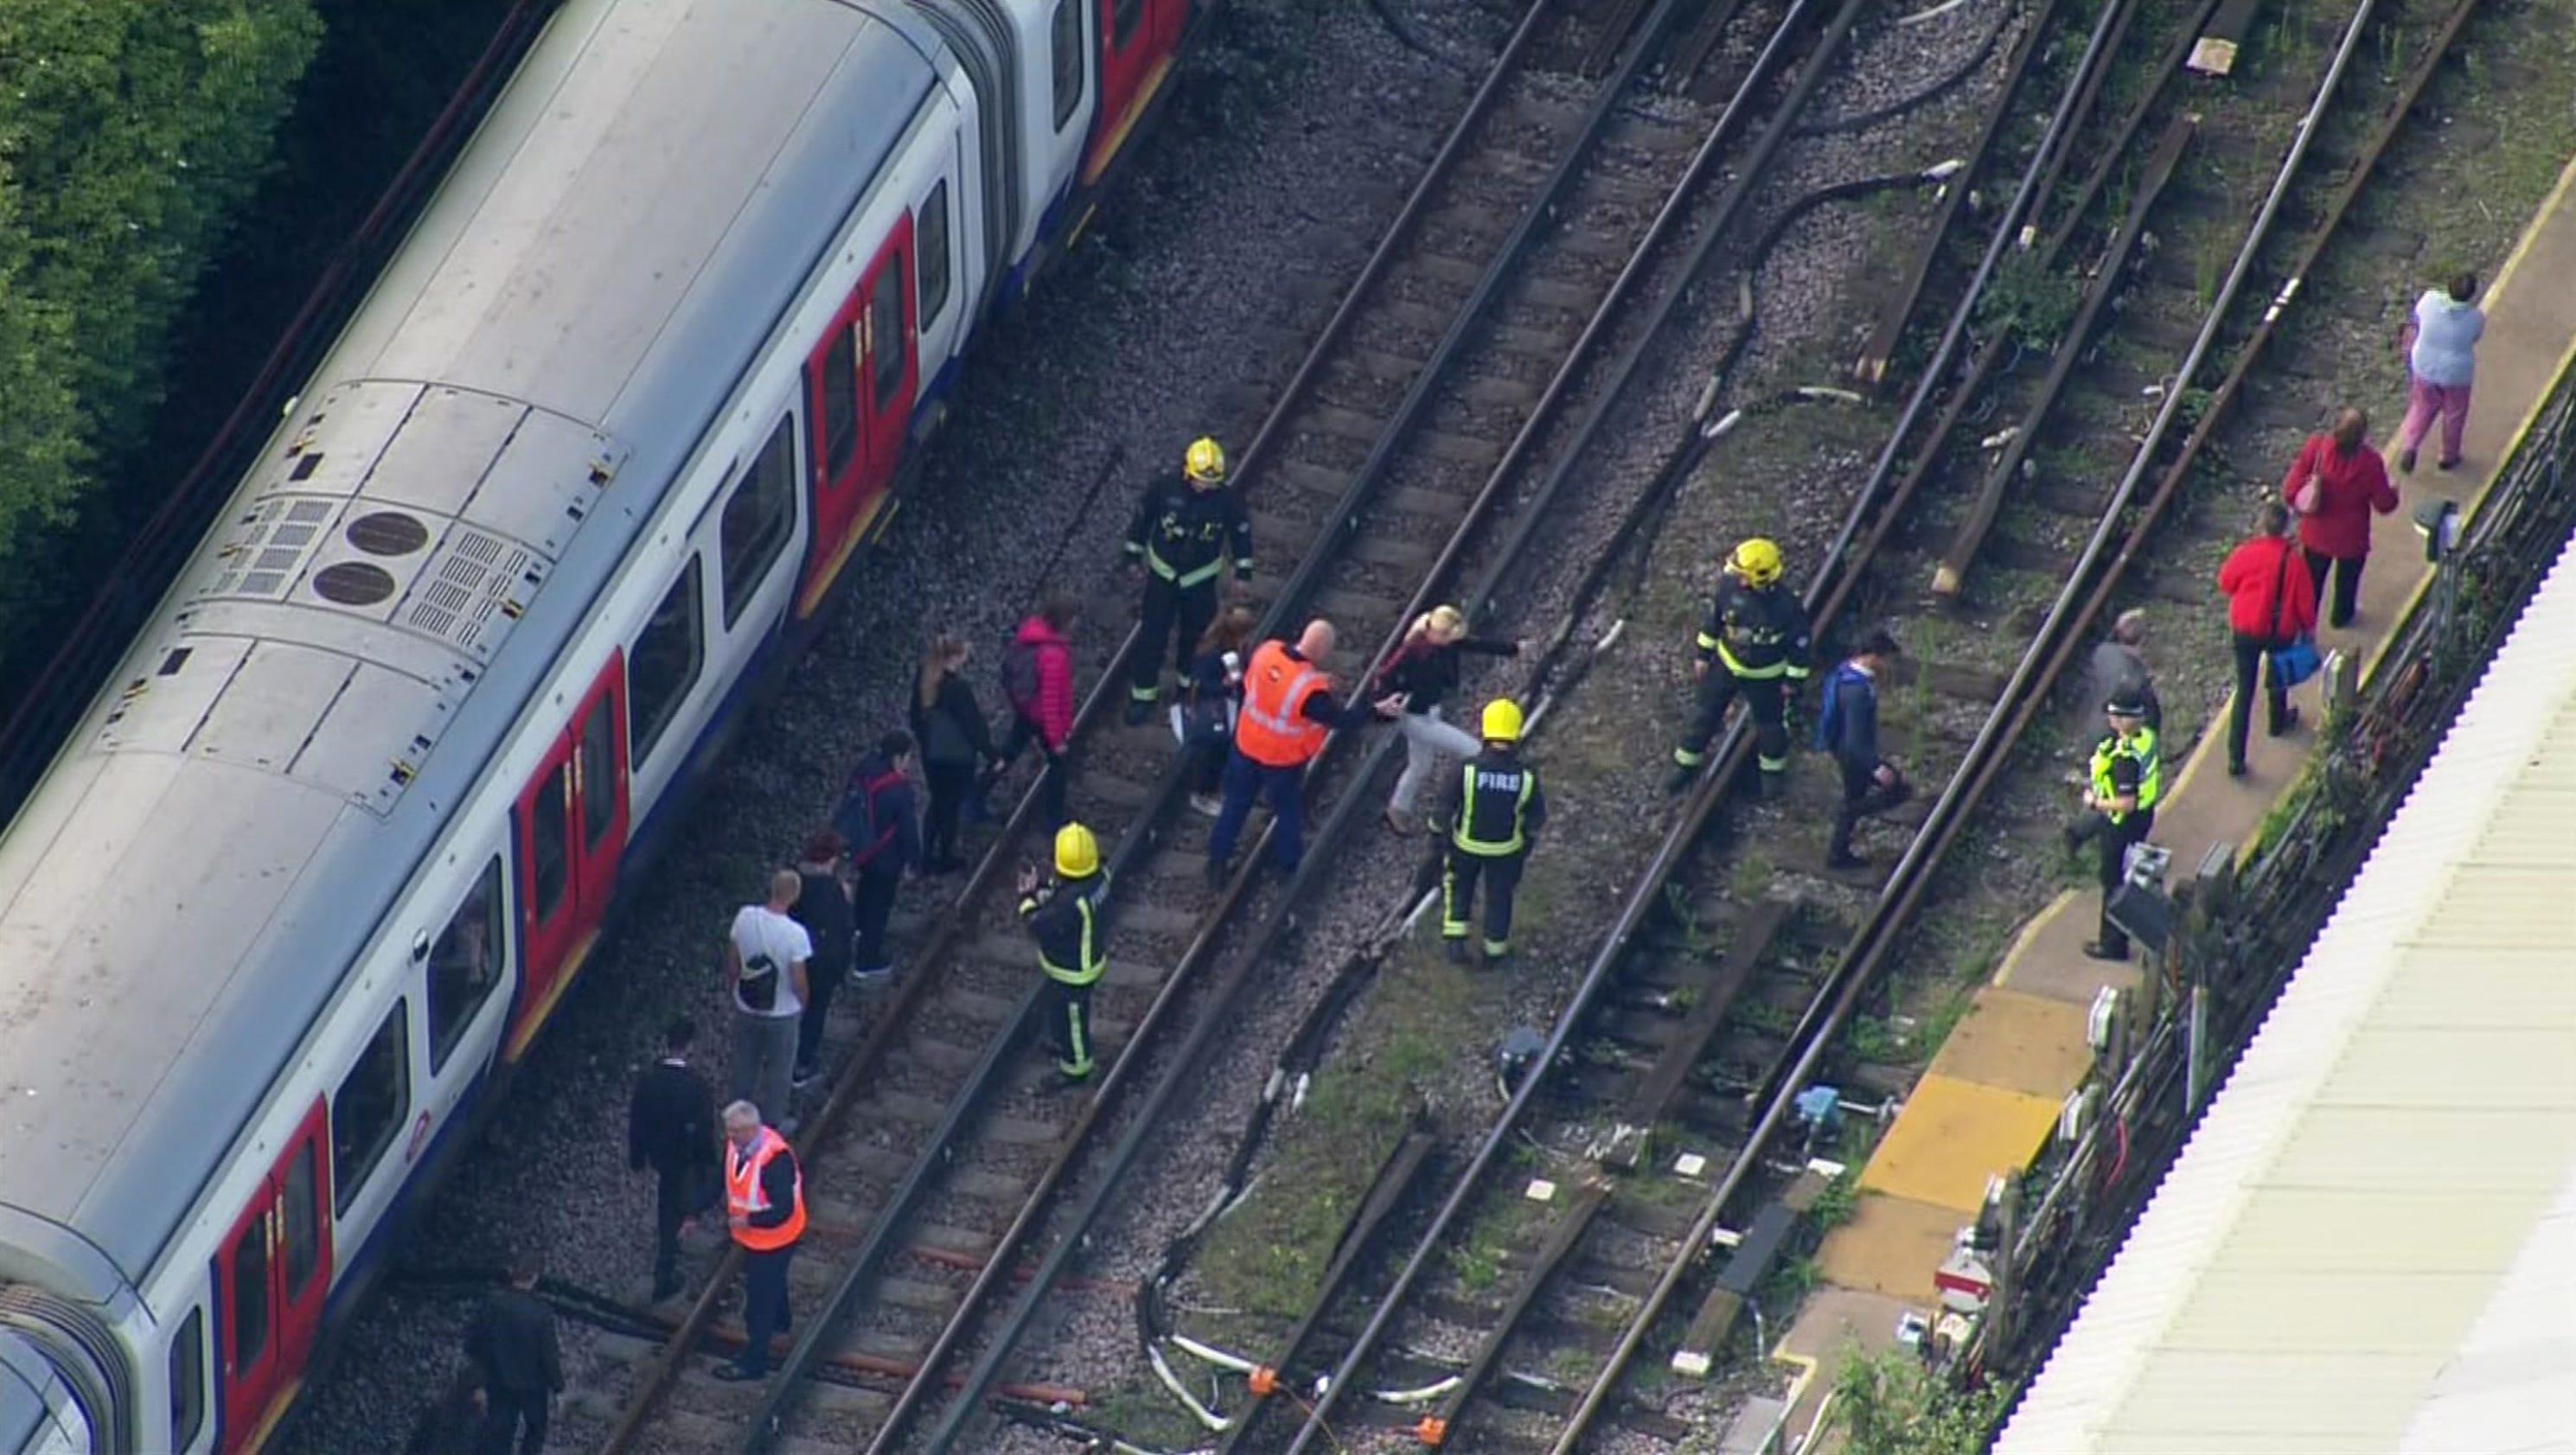 Terrorist-planted explosive hits London's Underground train